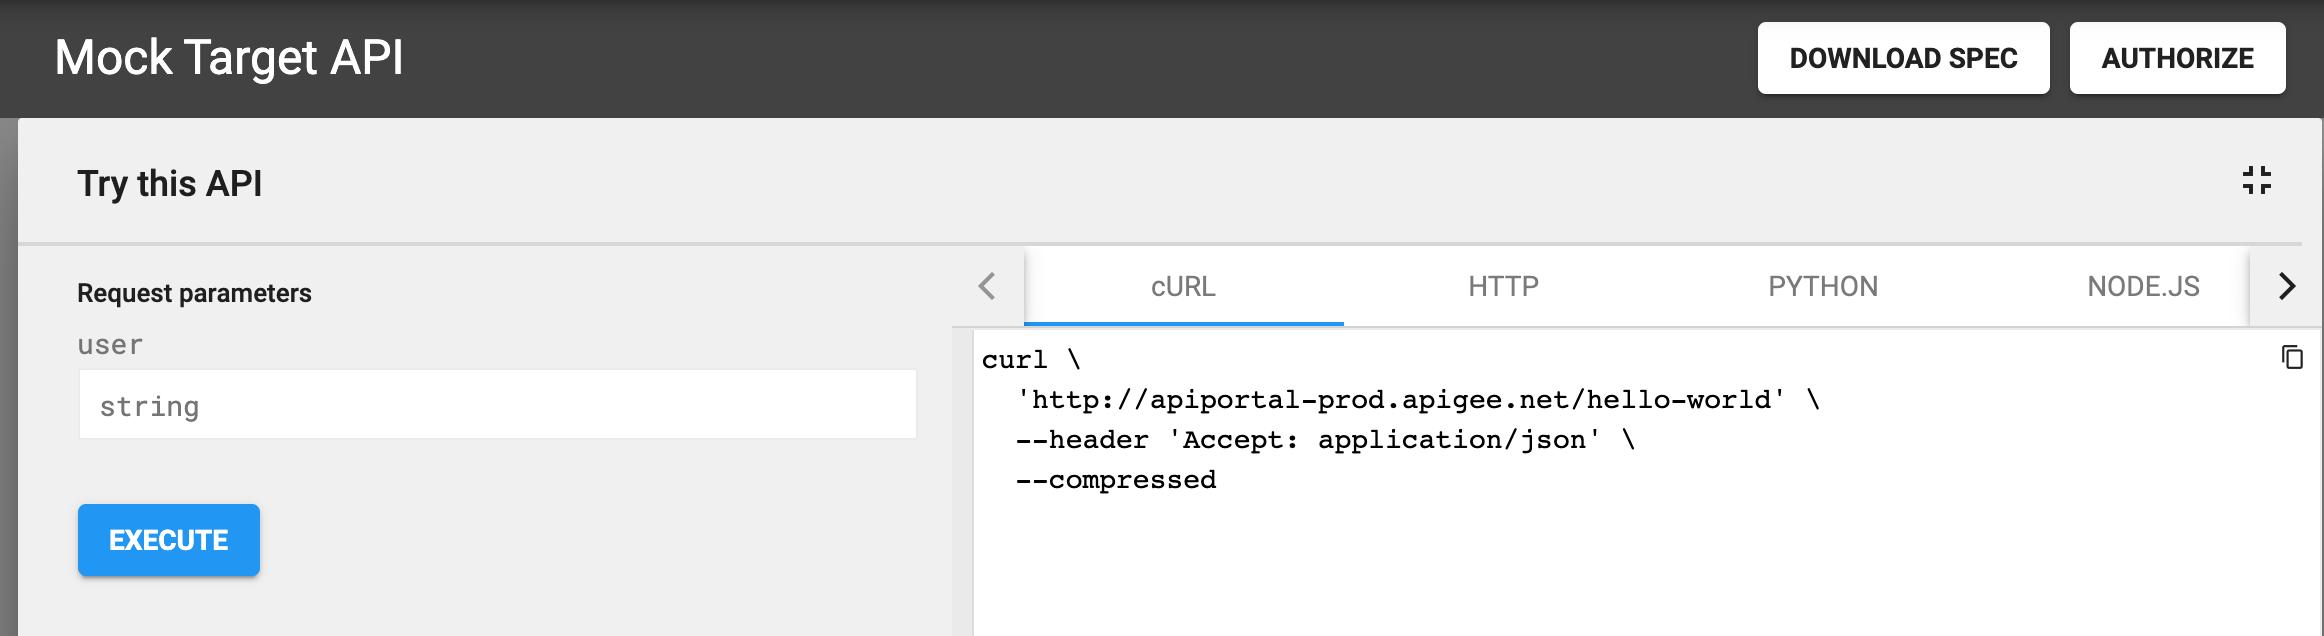 Publish your APIs | Apigee Docs